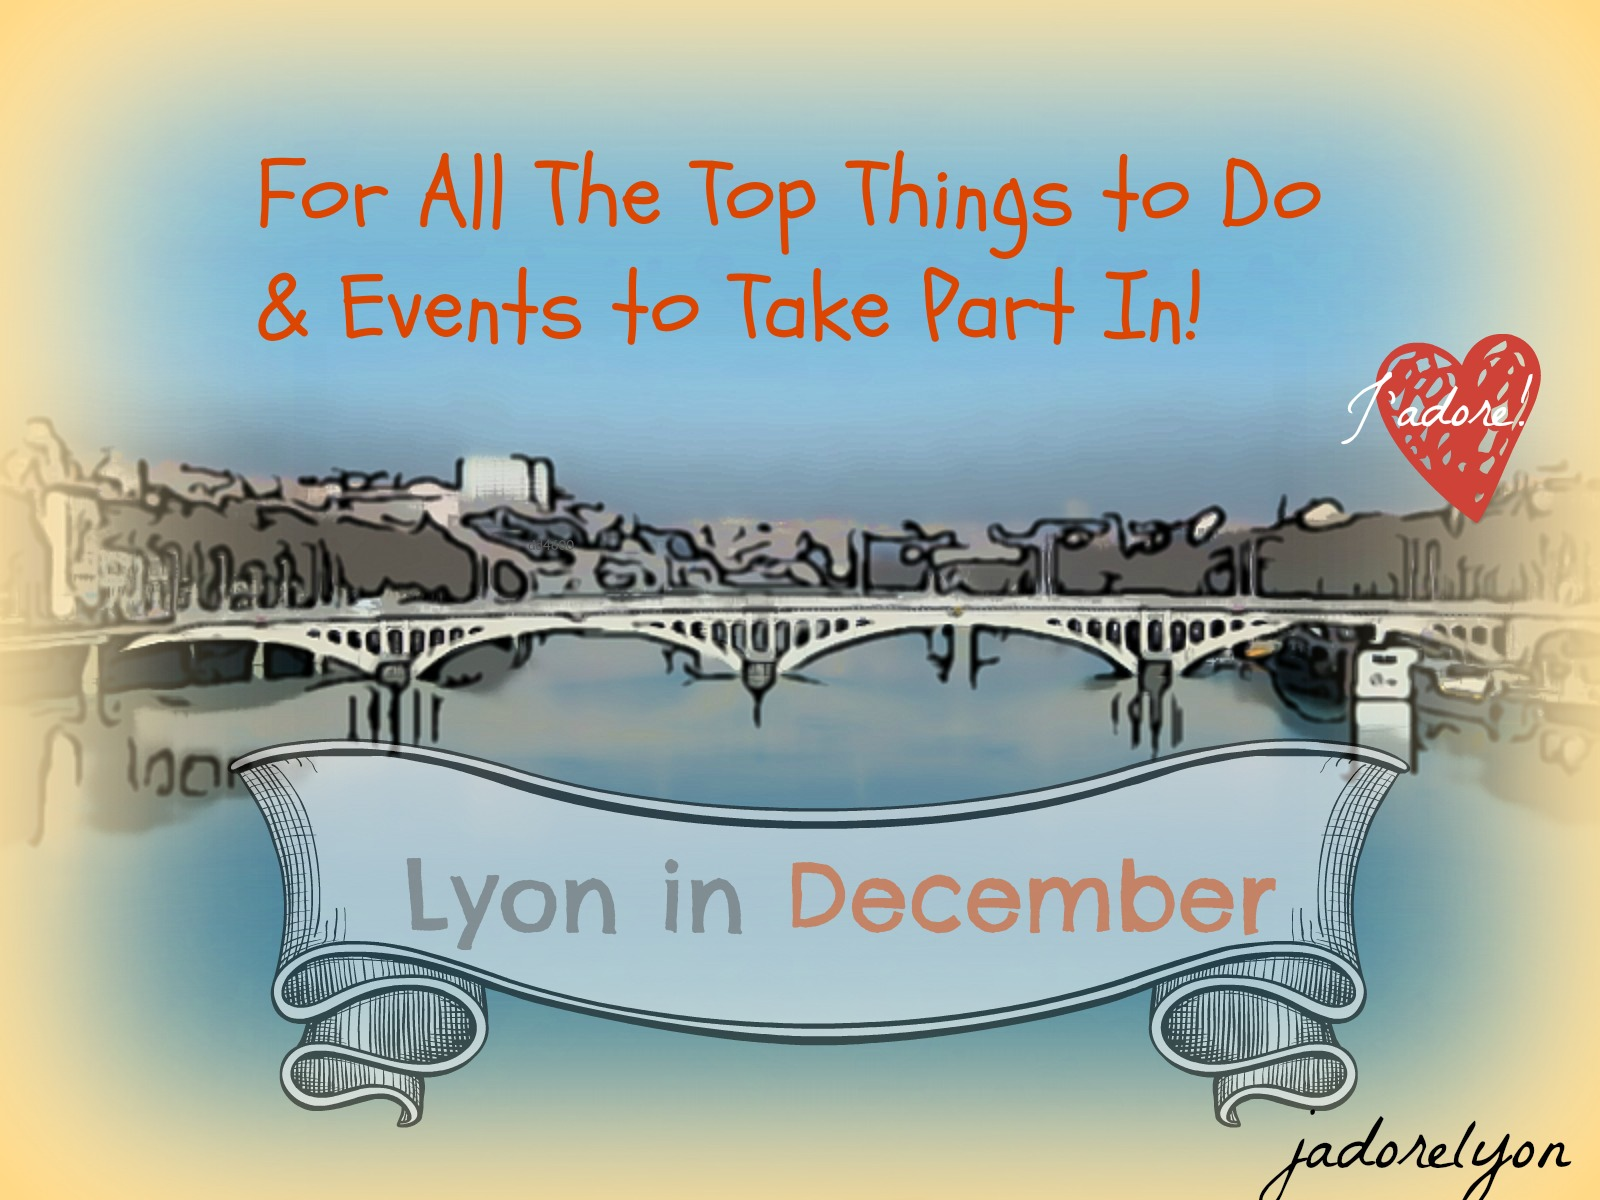 Lyon in December